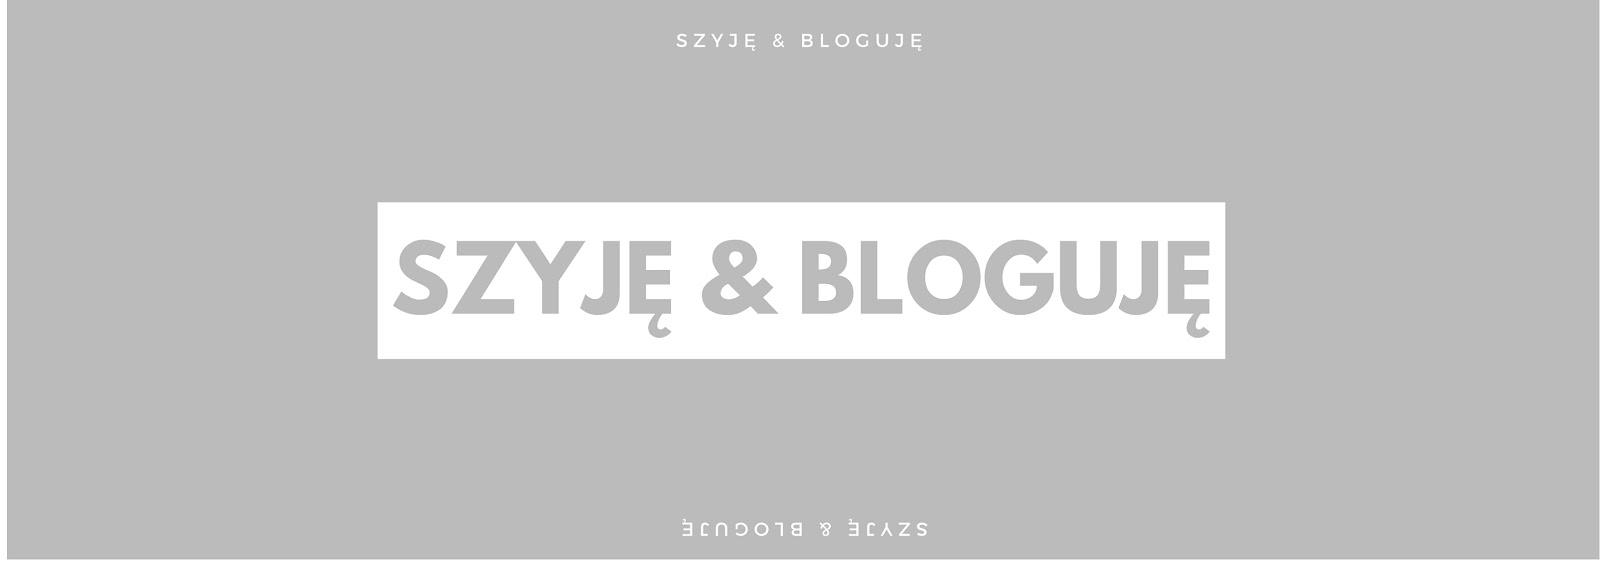 Szyję & Bloguję